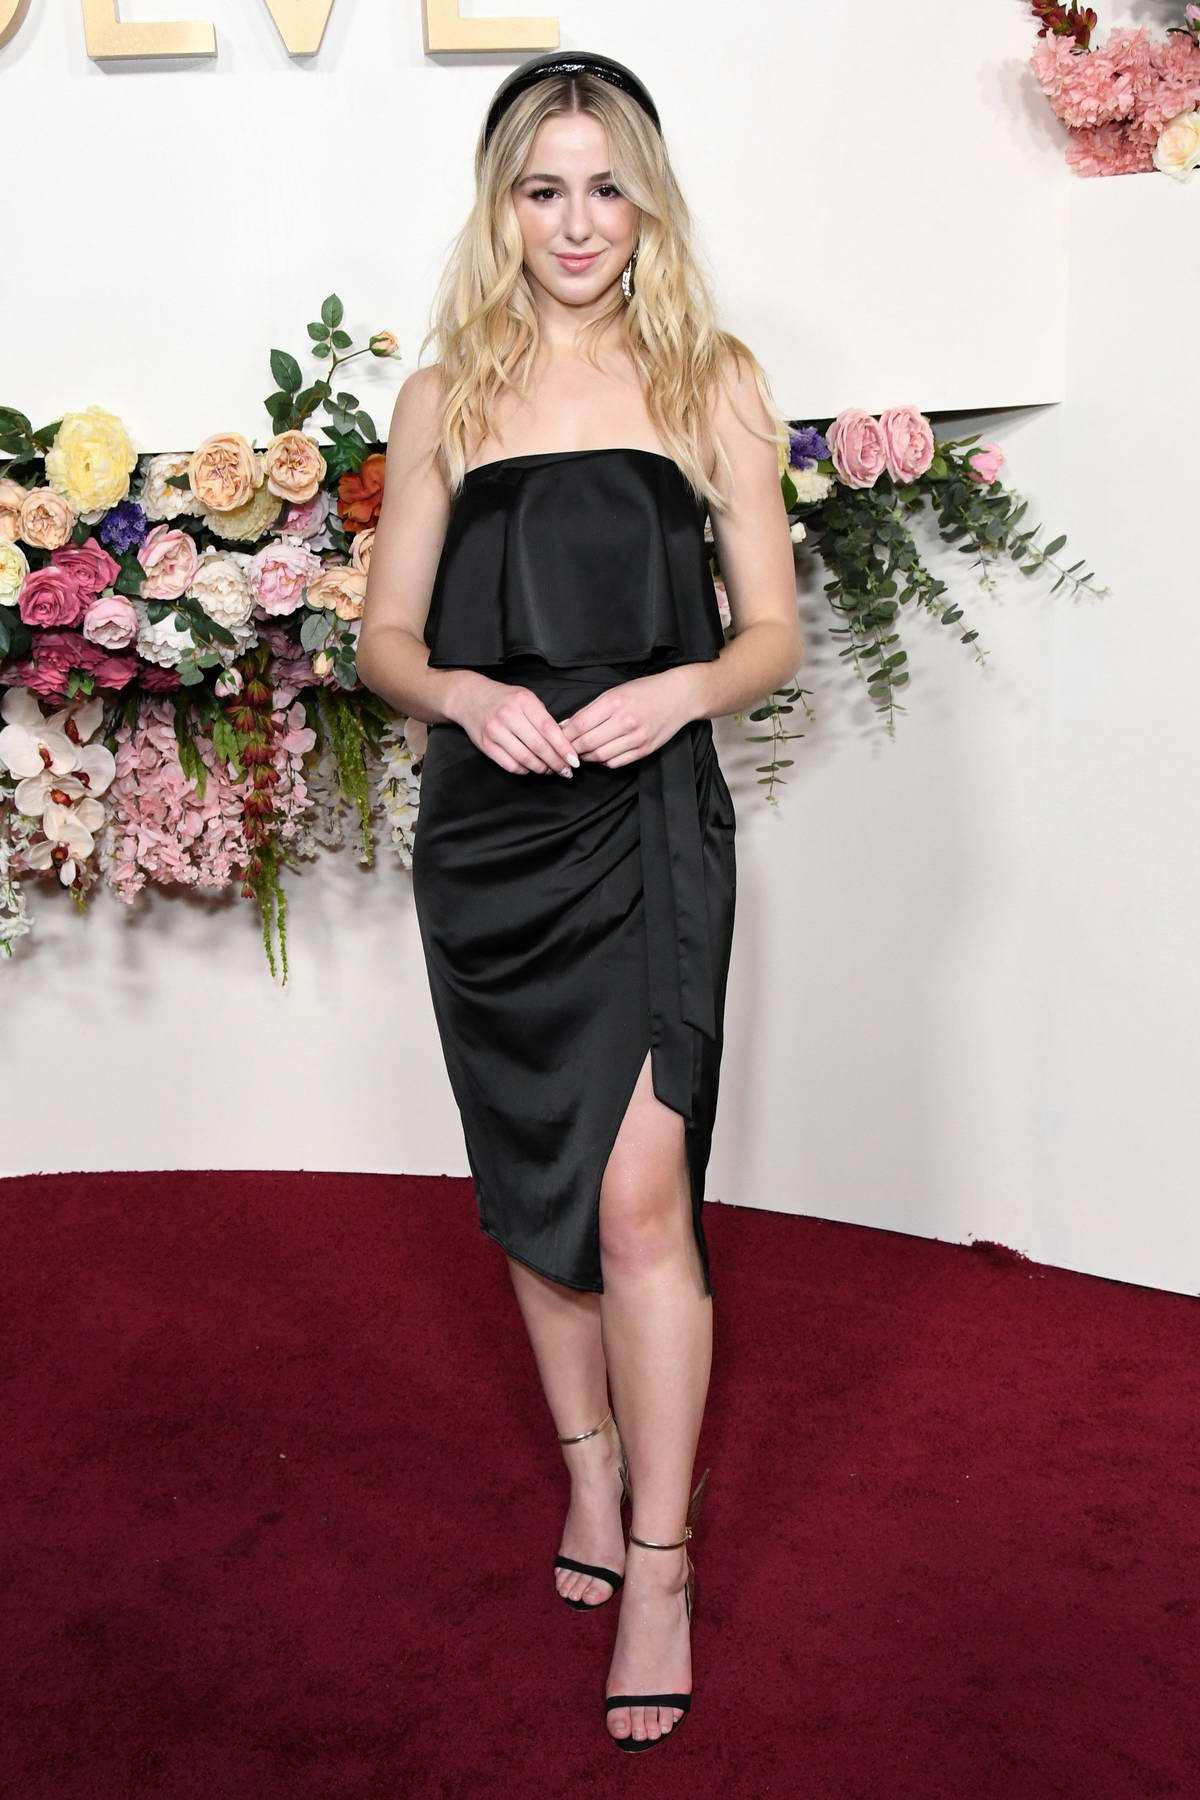 Chloe Lukasiak attends the 3rd Annual REVOLVE Awards at Goya Studios in Hollywood, California